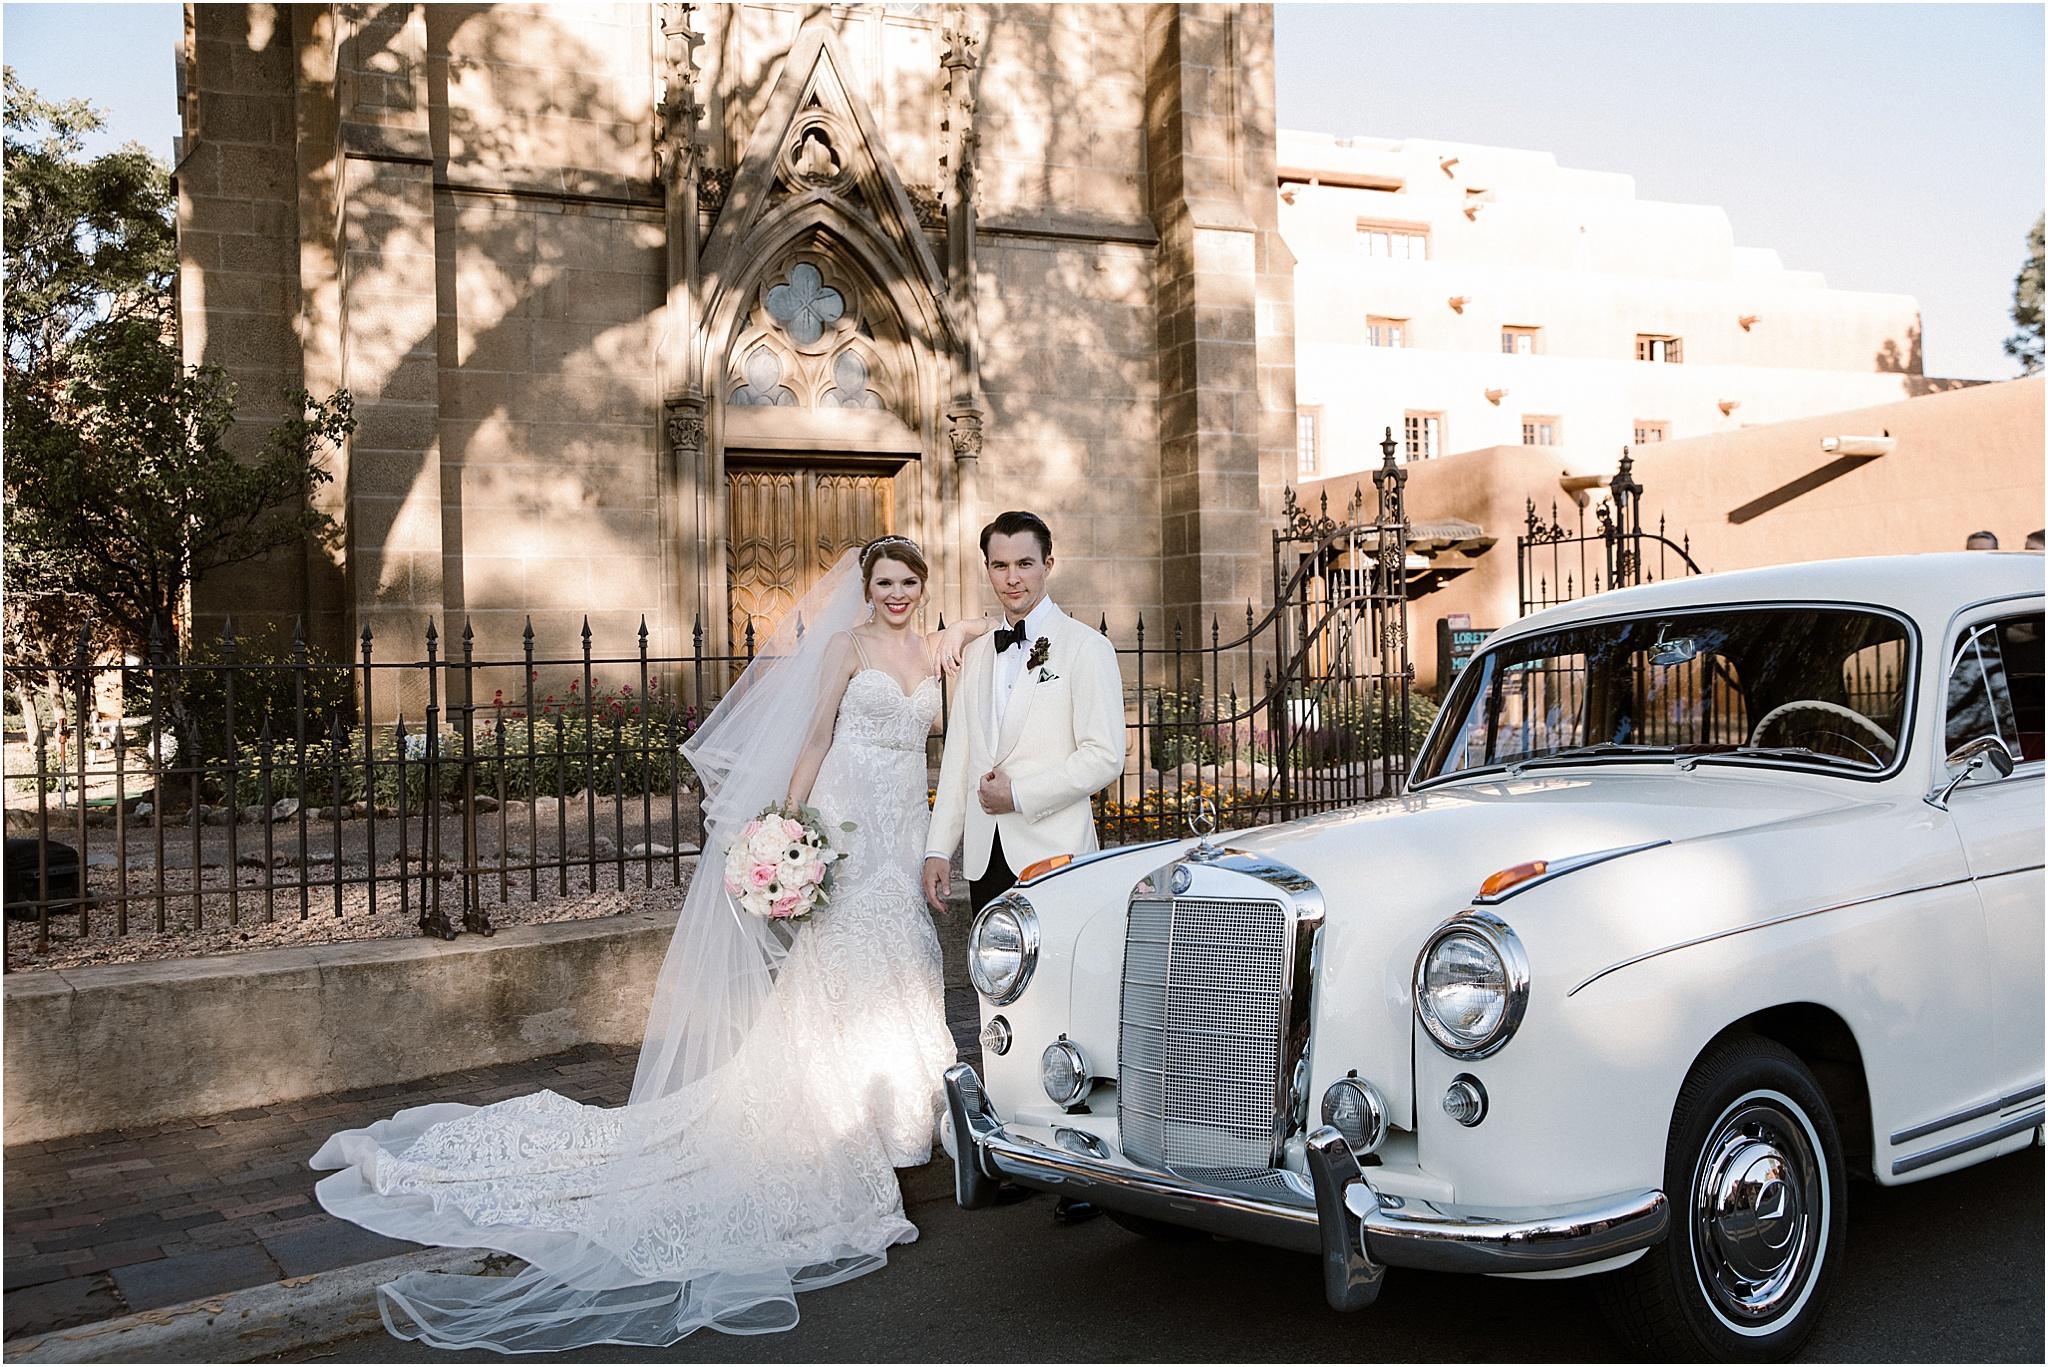 BLUE ROSE PHOTOGRAPHY SANTA FE WEDDING_35